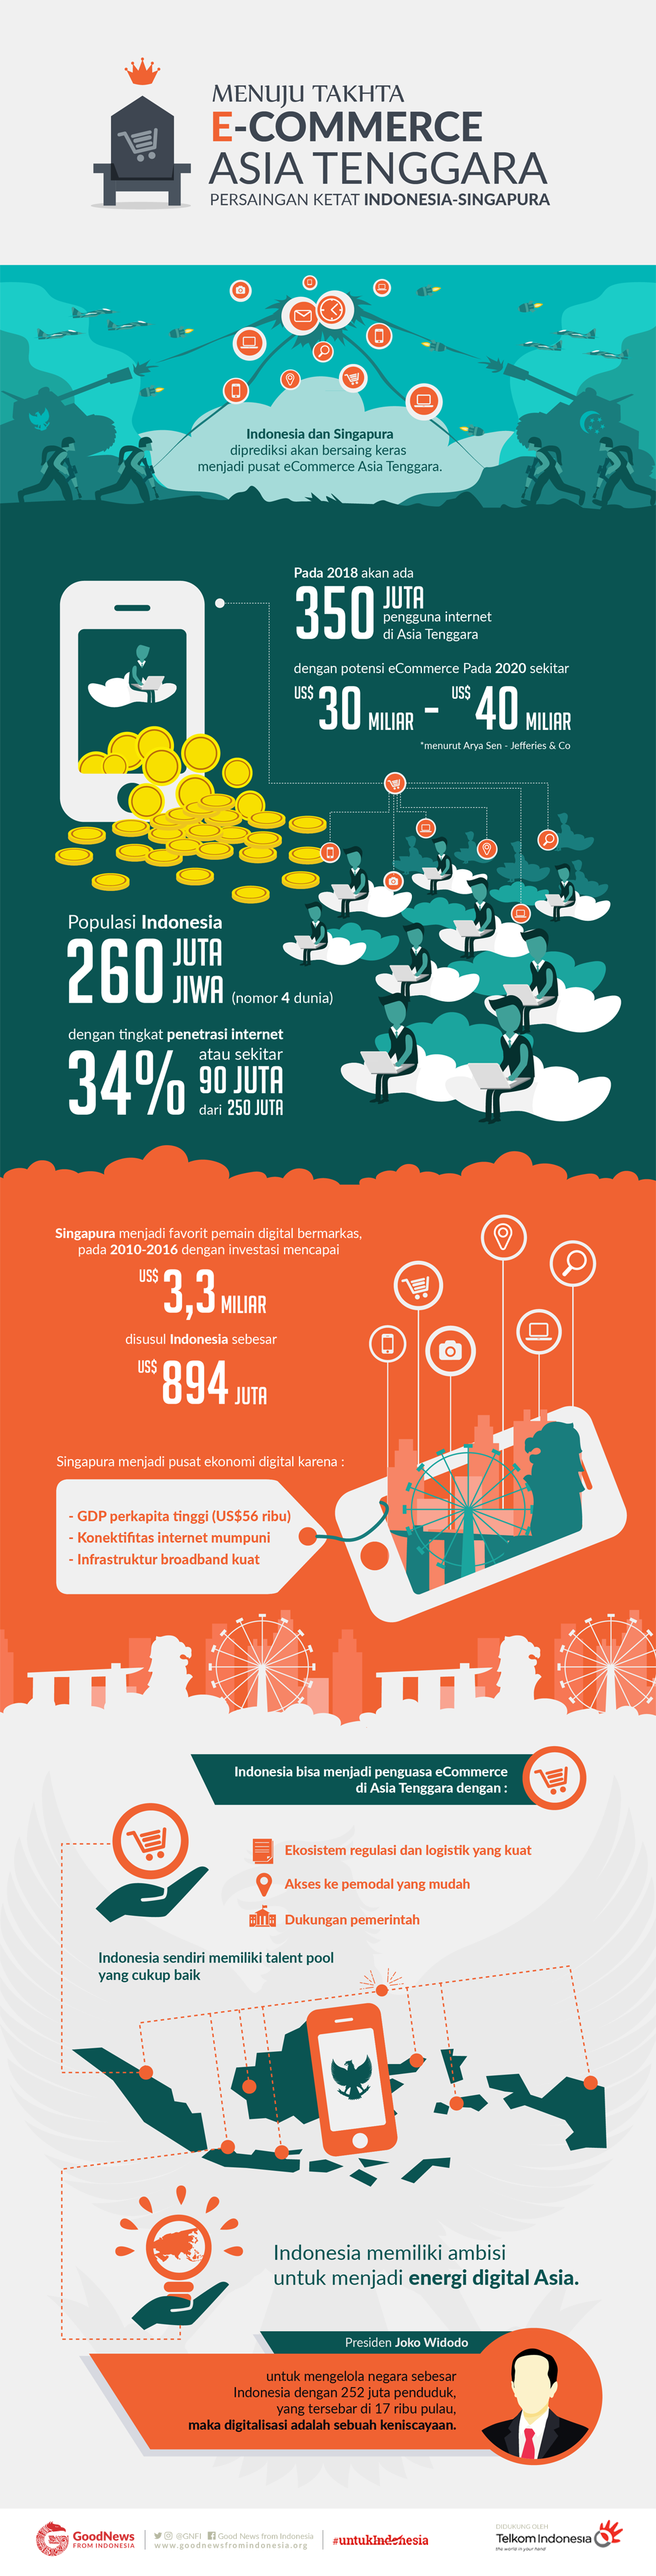 Indonesia, Menuju Takhta E-Commerce Asia Tenggara